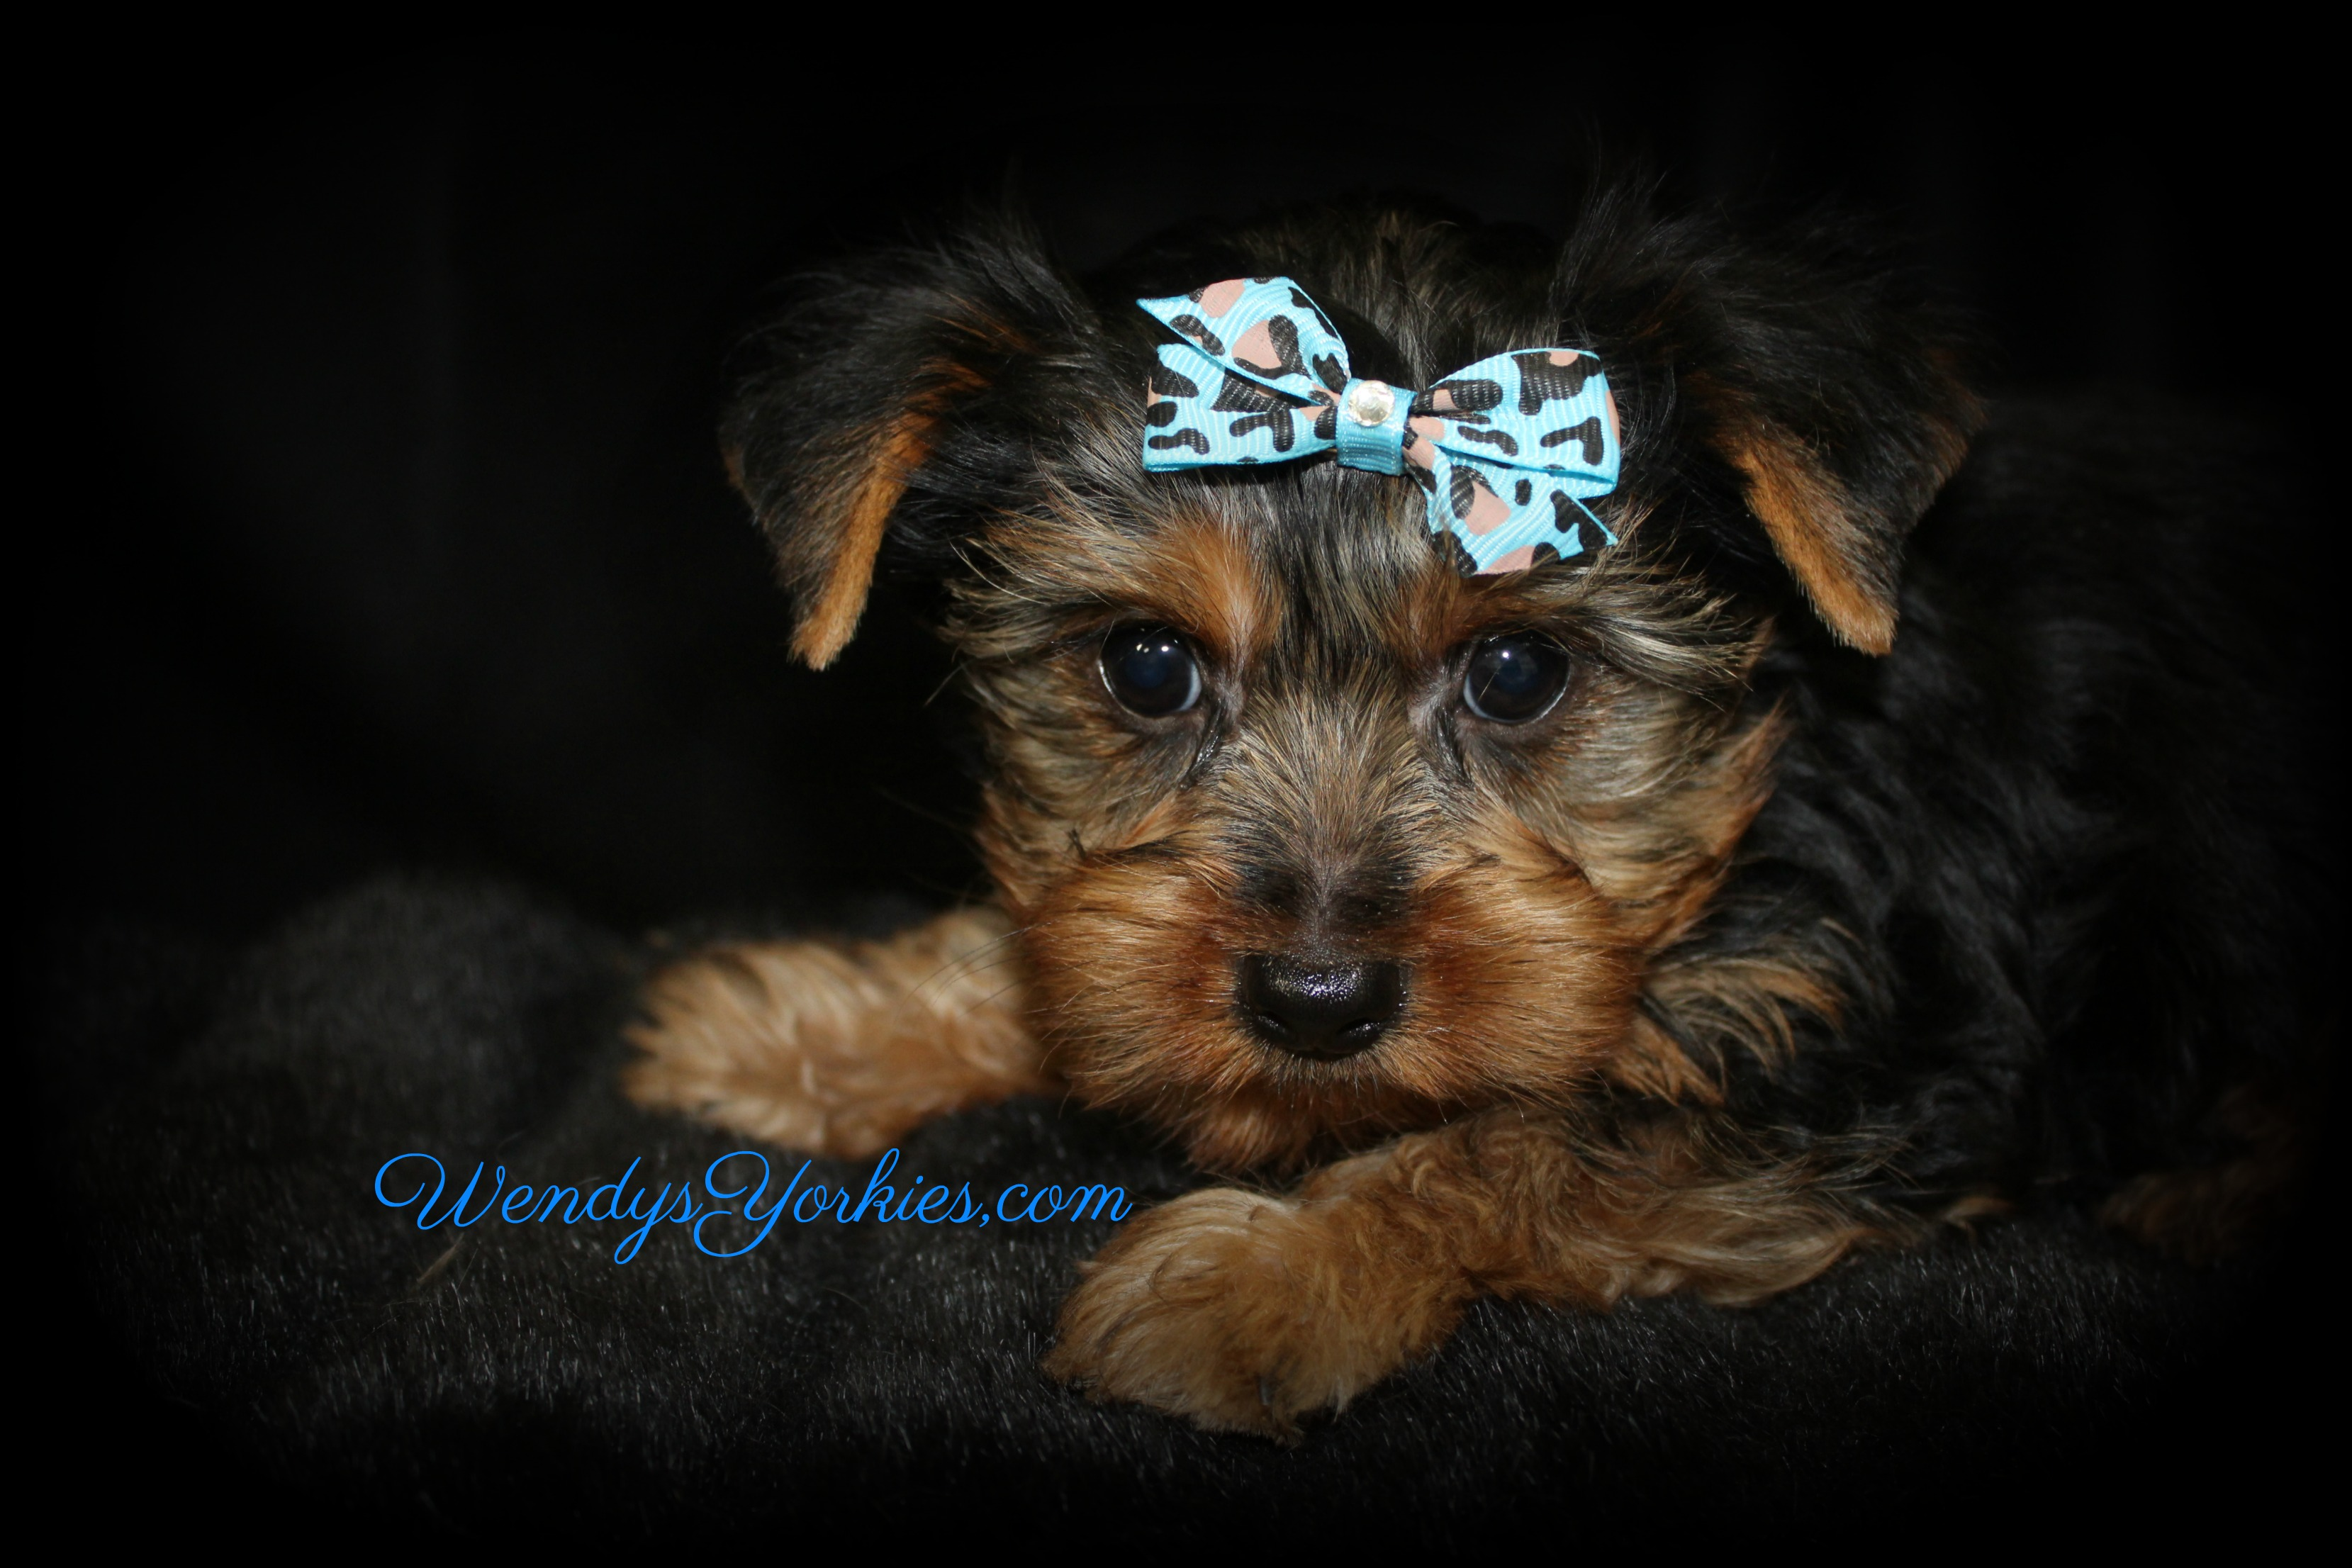 Male Yorkie puppy for sale, Tm1, WendysYorkies.com